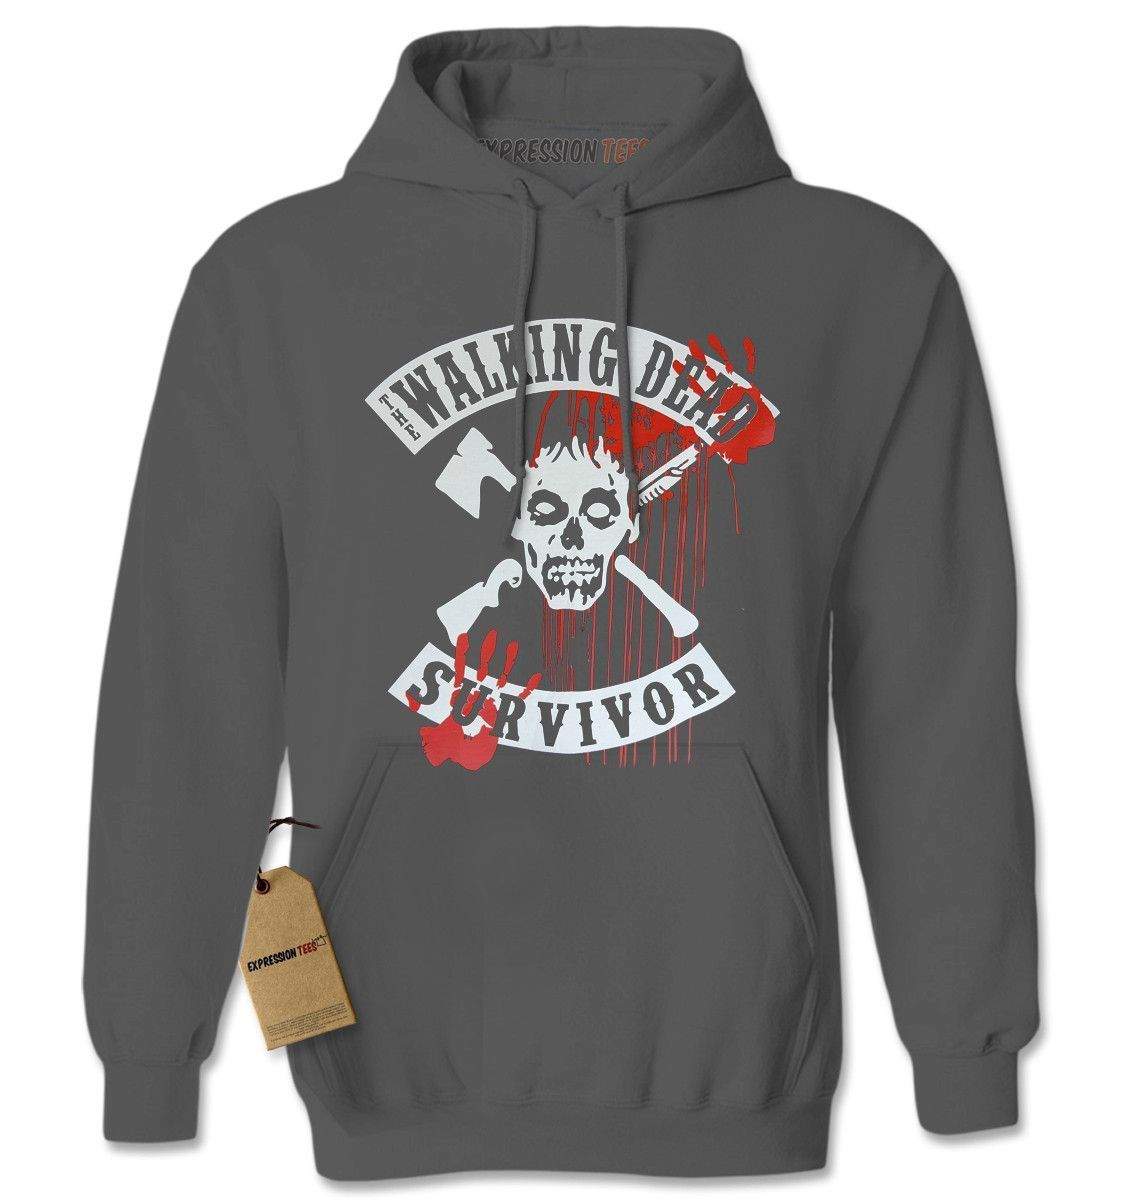 The Walking Dead Survivor Adult Hoodie Sweatshirt